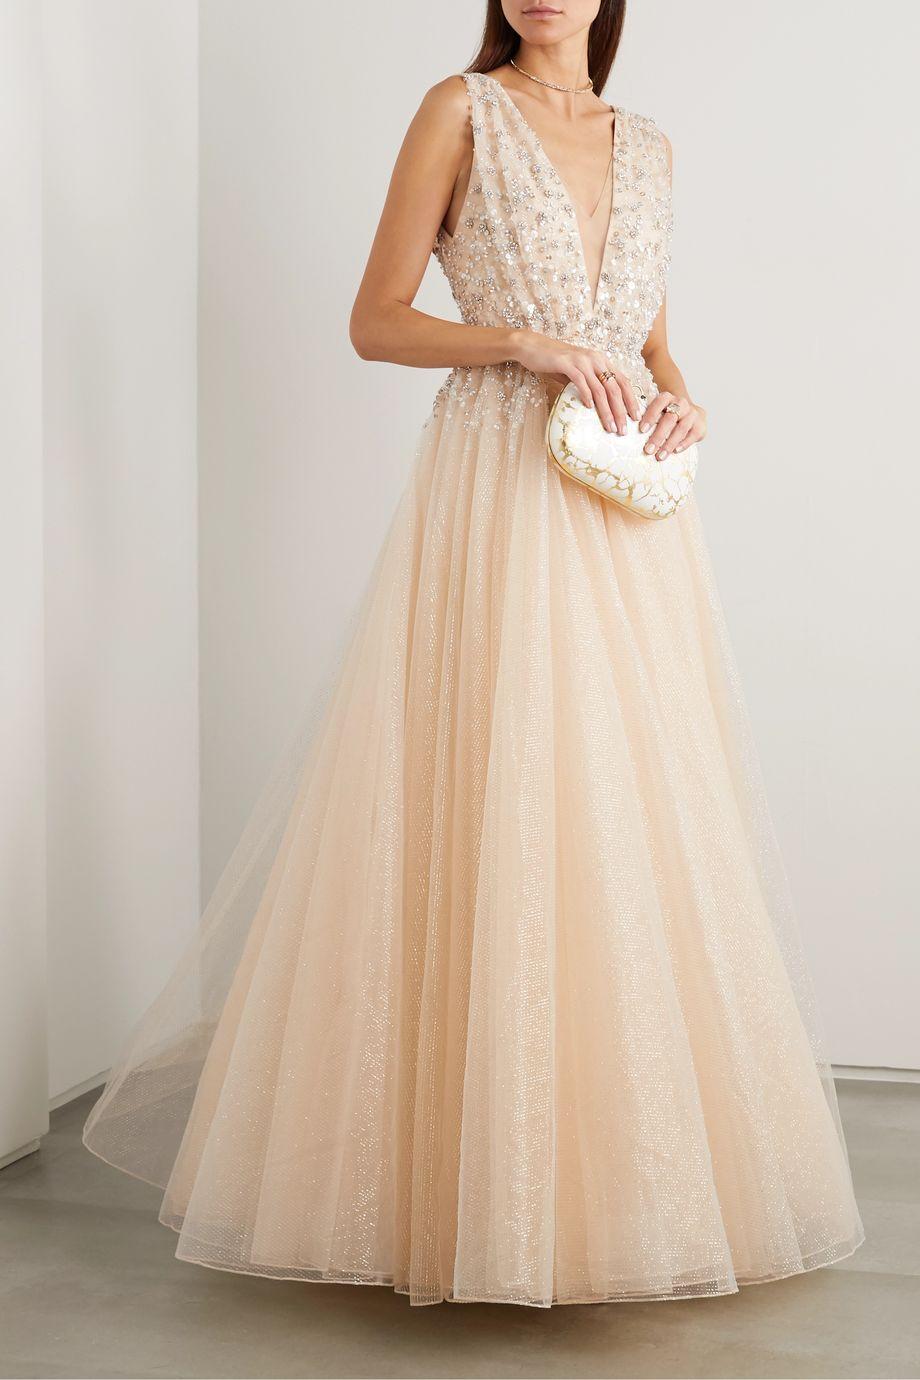 Jenny Packham Jeanne embellished glittered tulle gown